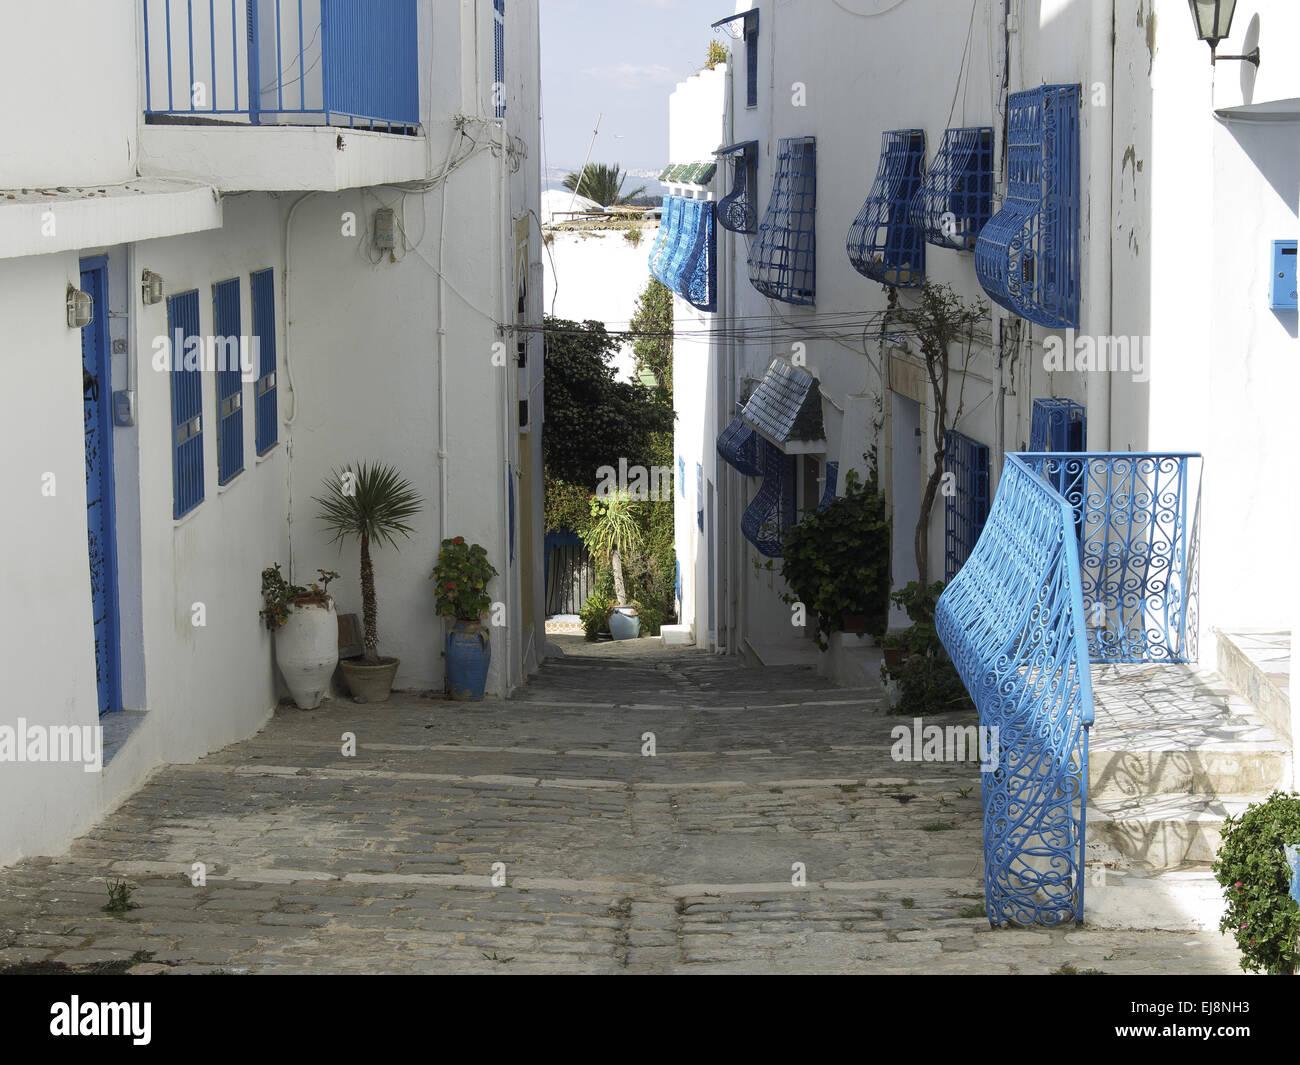 Tunesia - Stock Image